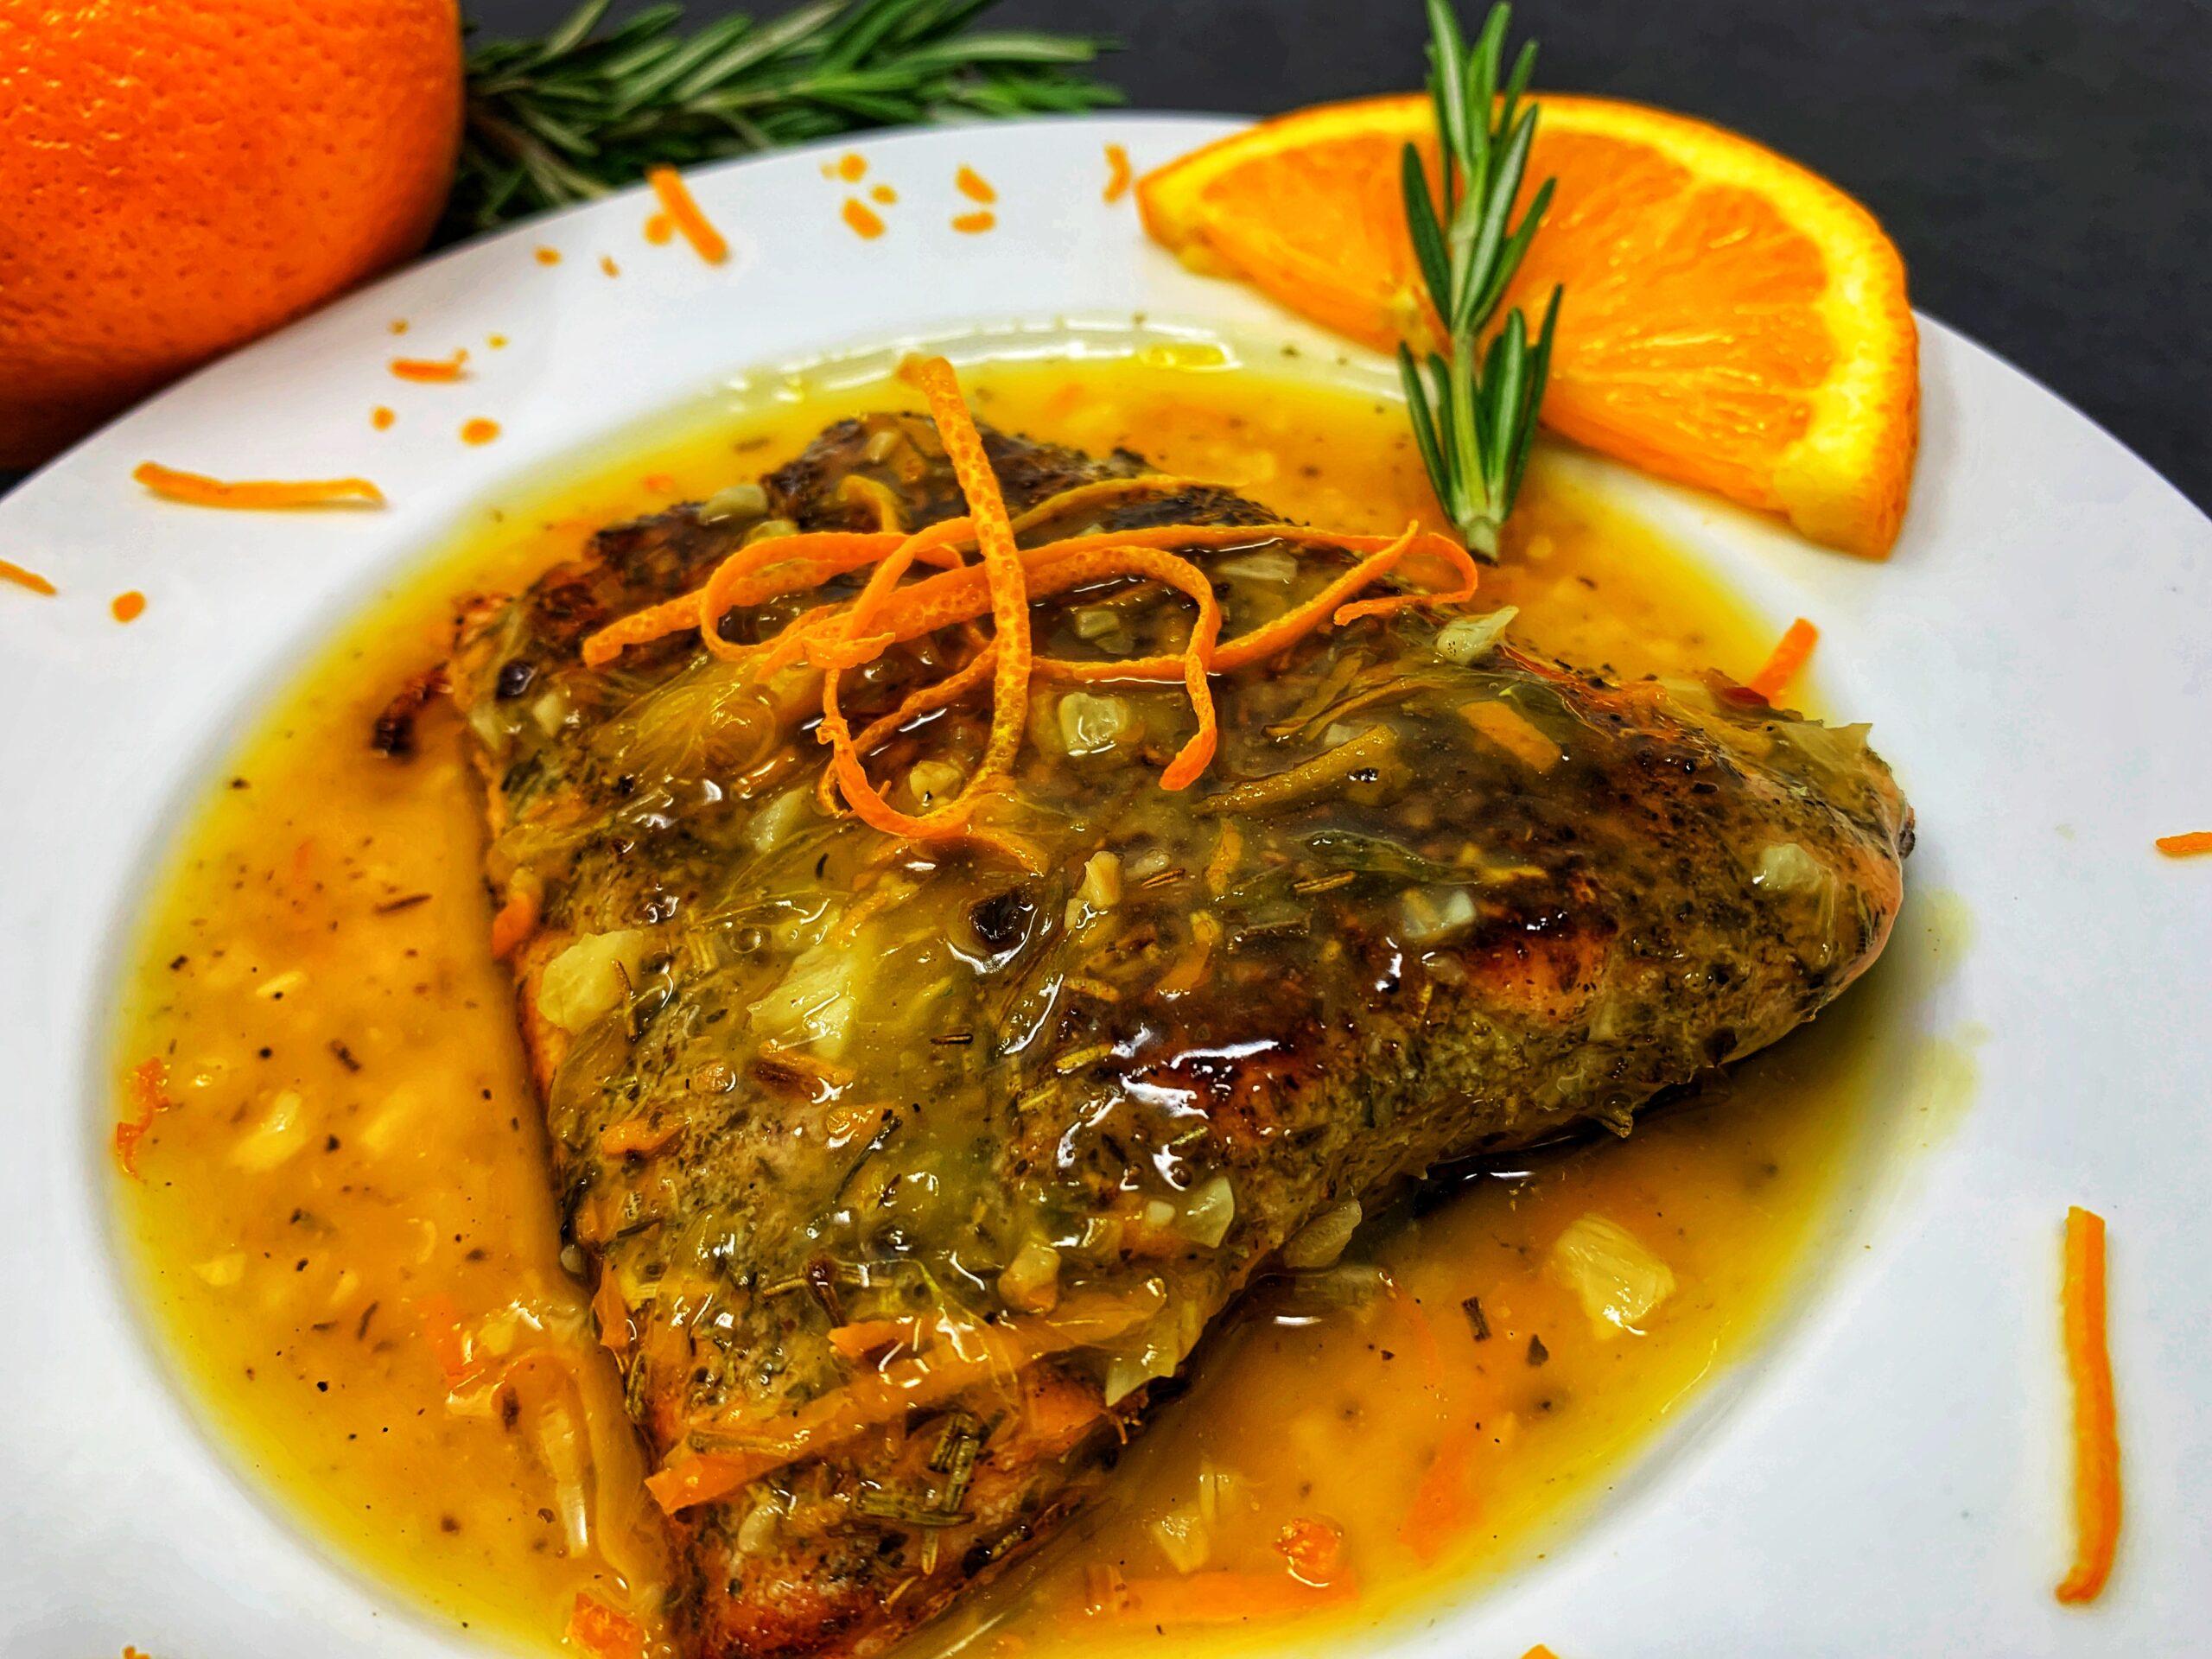 Orange Rosemary Salmon